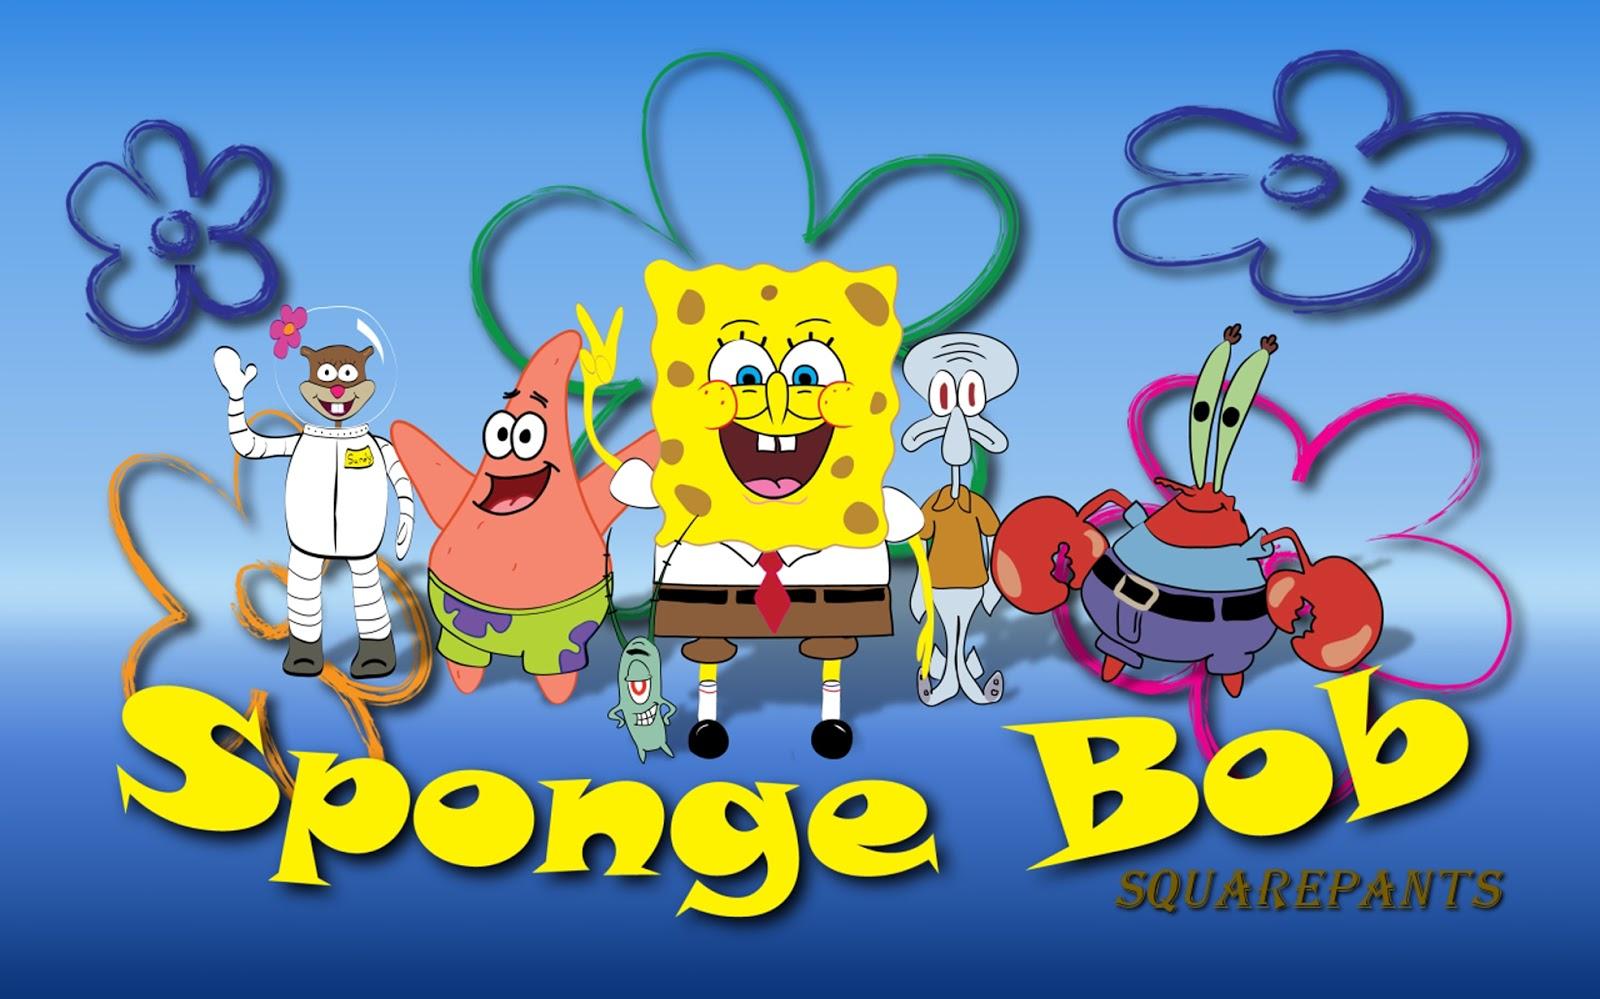 Unduh 6300 Gambar Spongebob Lucu Buat Wallpaper Terbaru